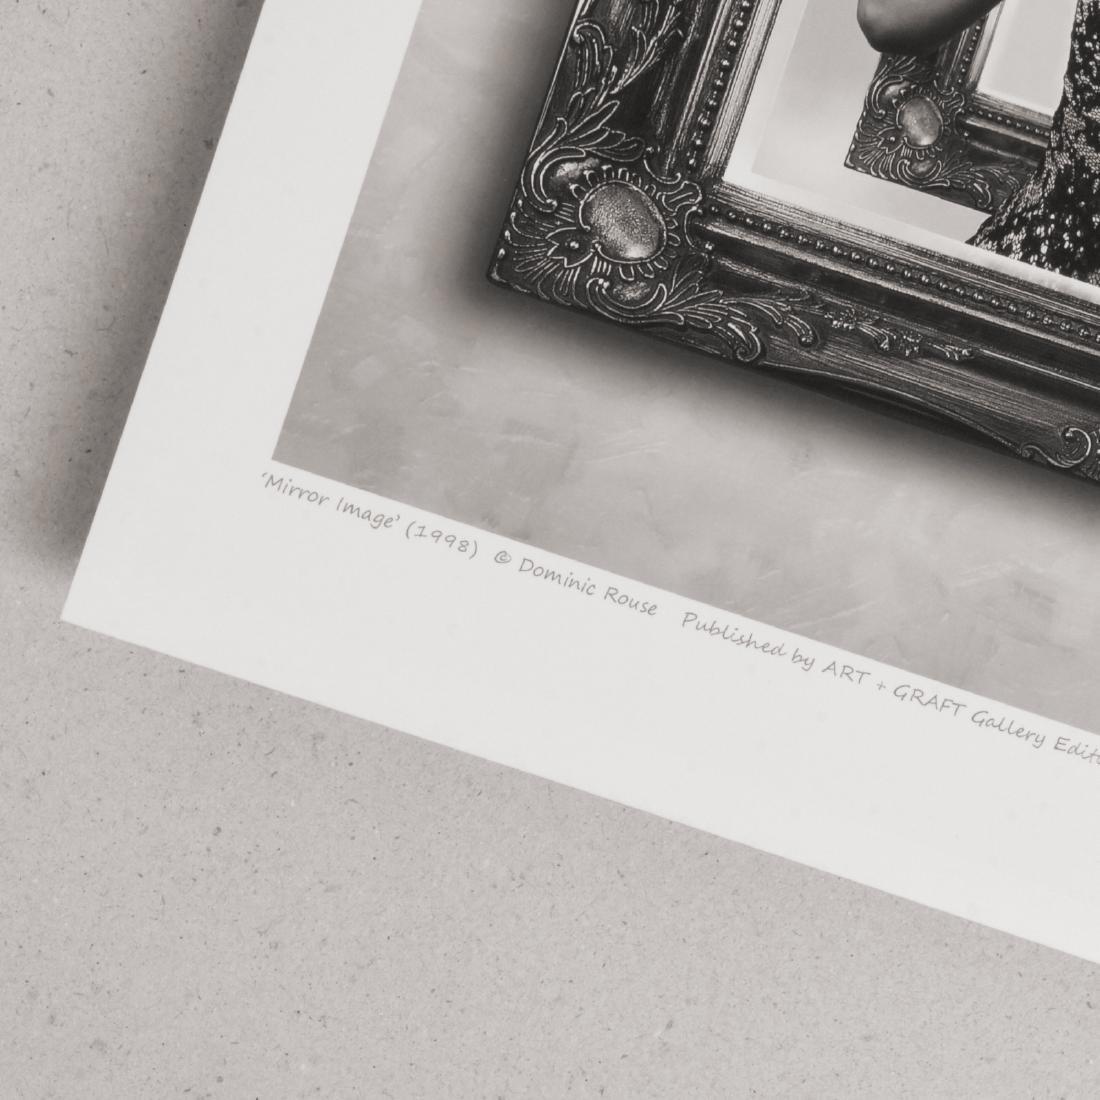 Dominic Rouse Mirror Image Print - 4